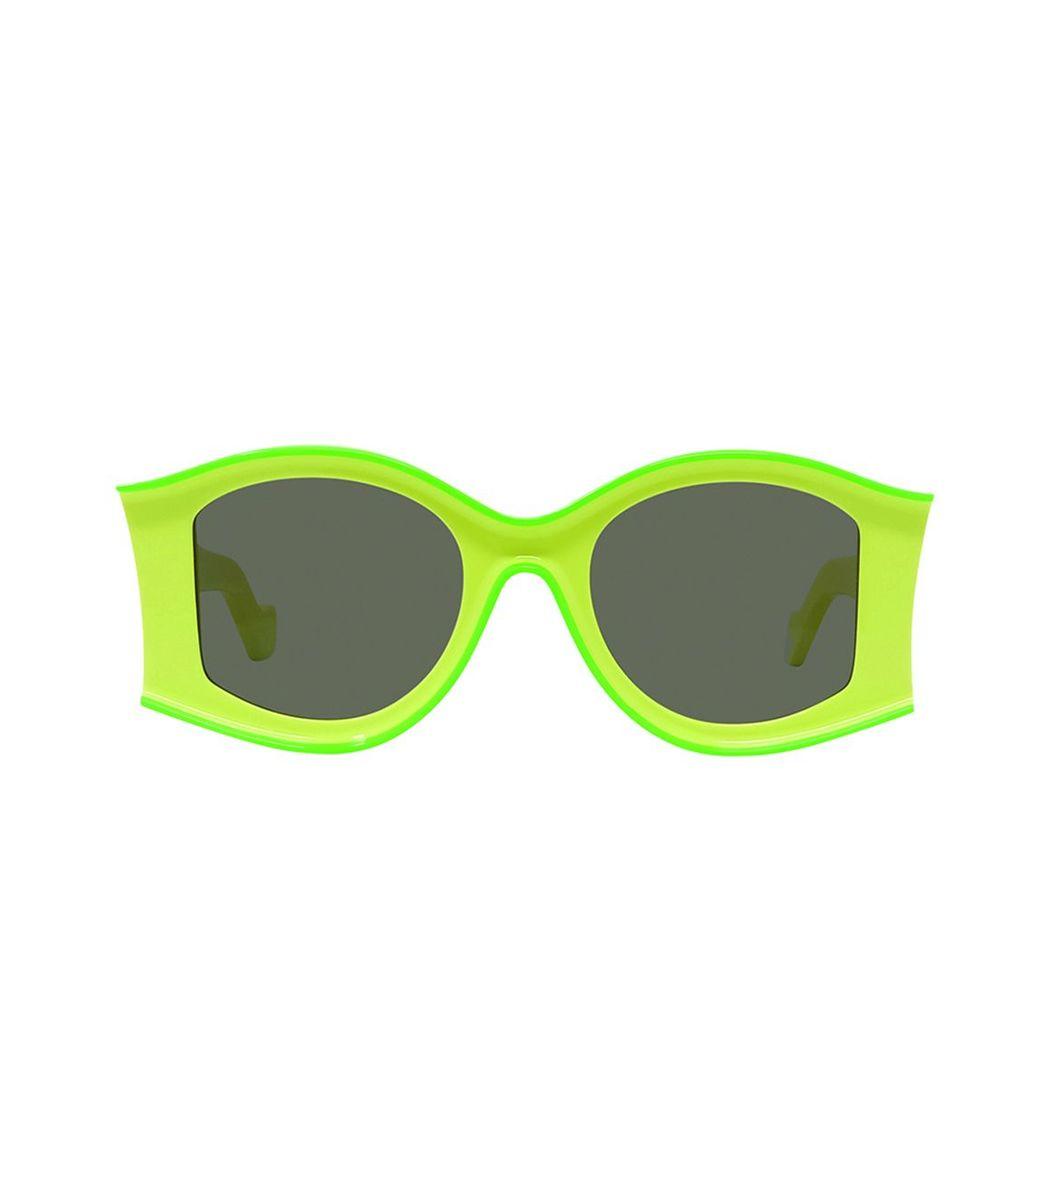 Loewe Fluorescent Green Large Sunglasses